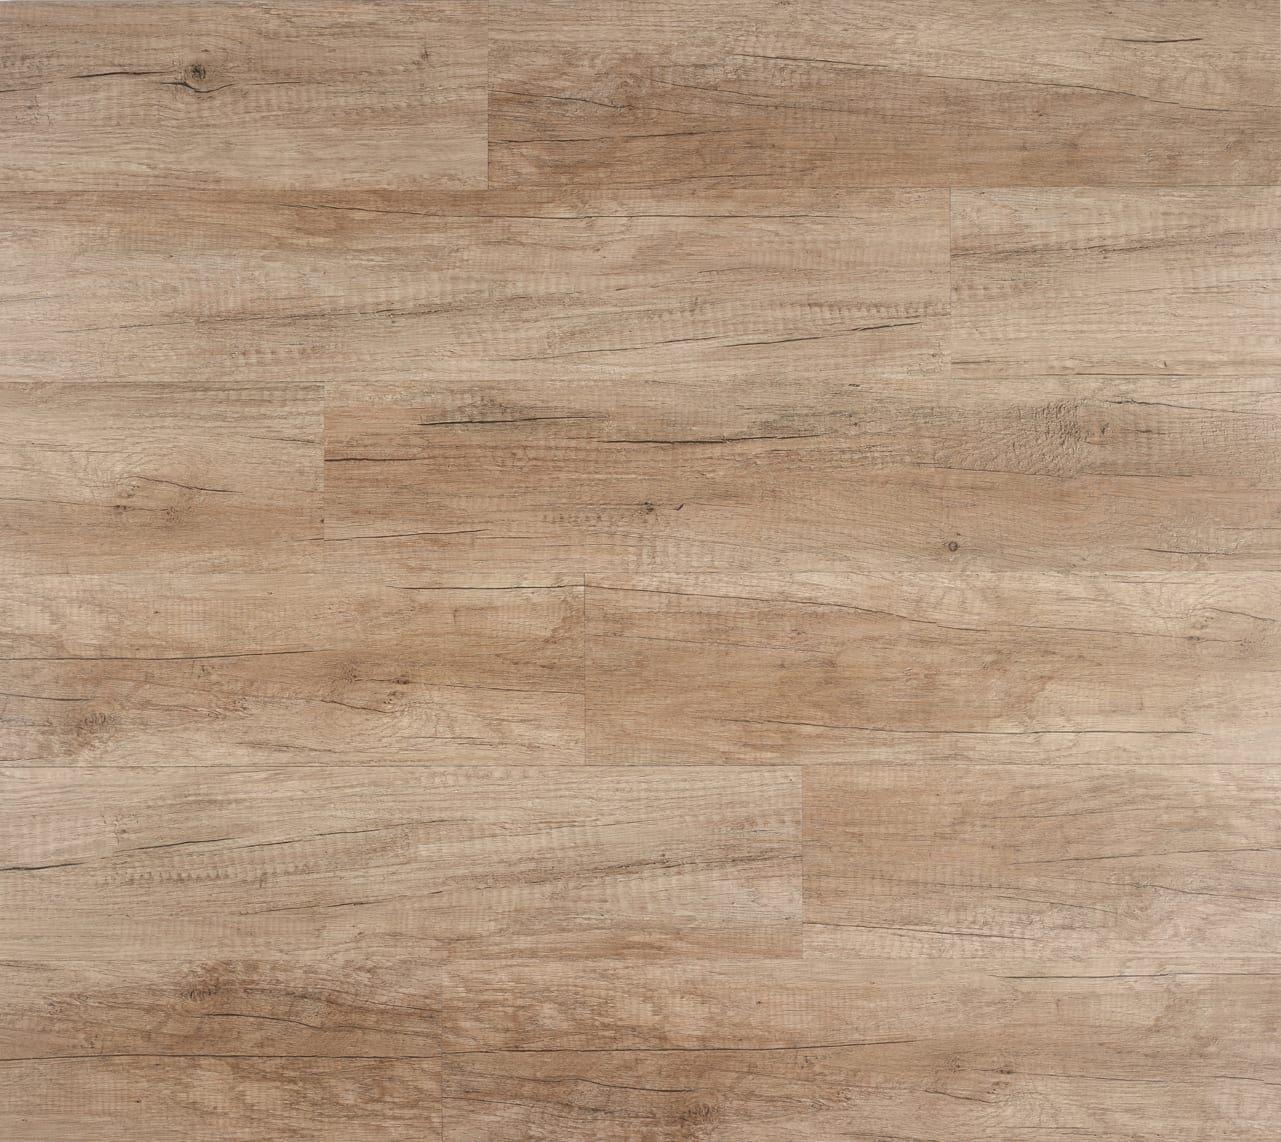 natural oak pvc wall panel wood effect wall panel targwall. Black Bedroom Furniture Sets. Home Design Ideas